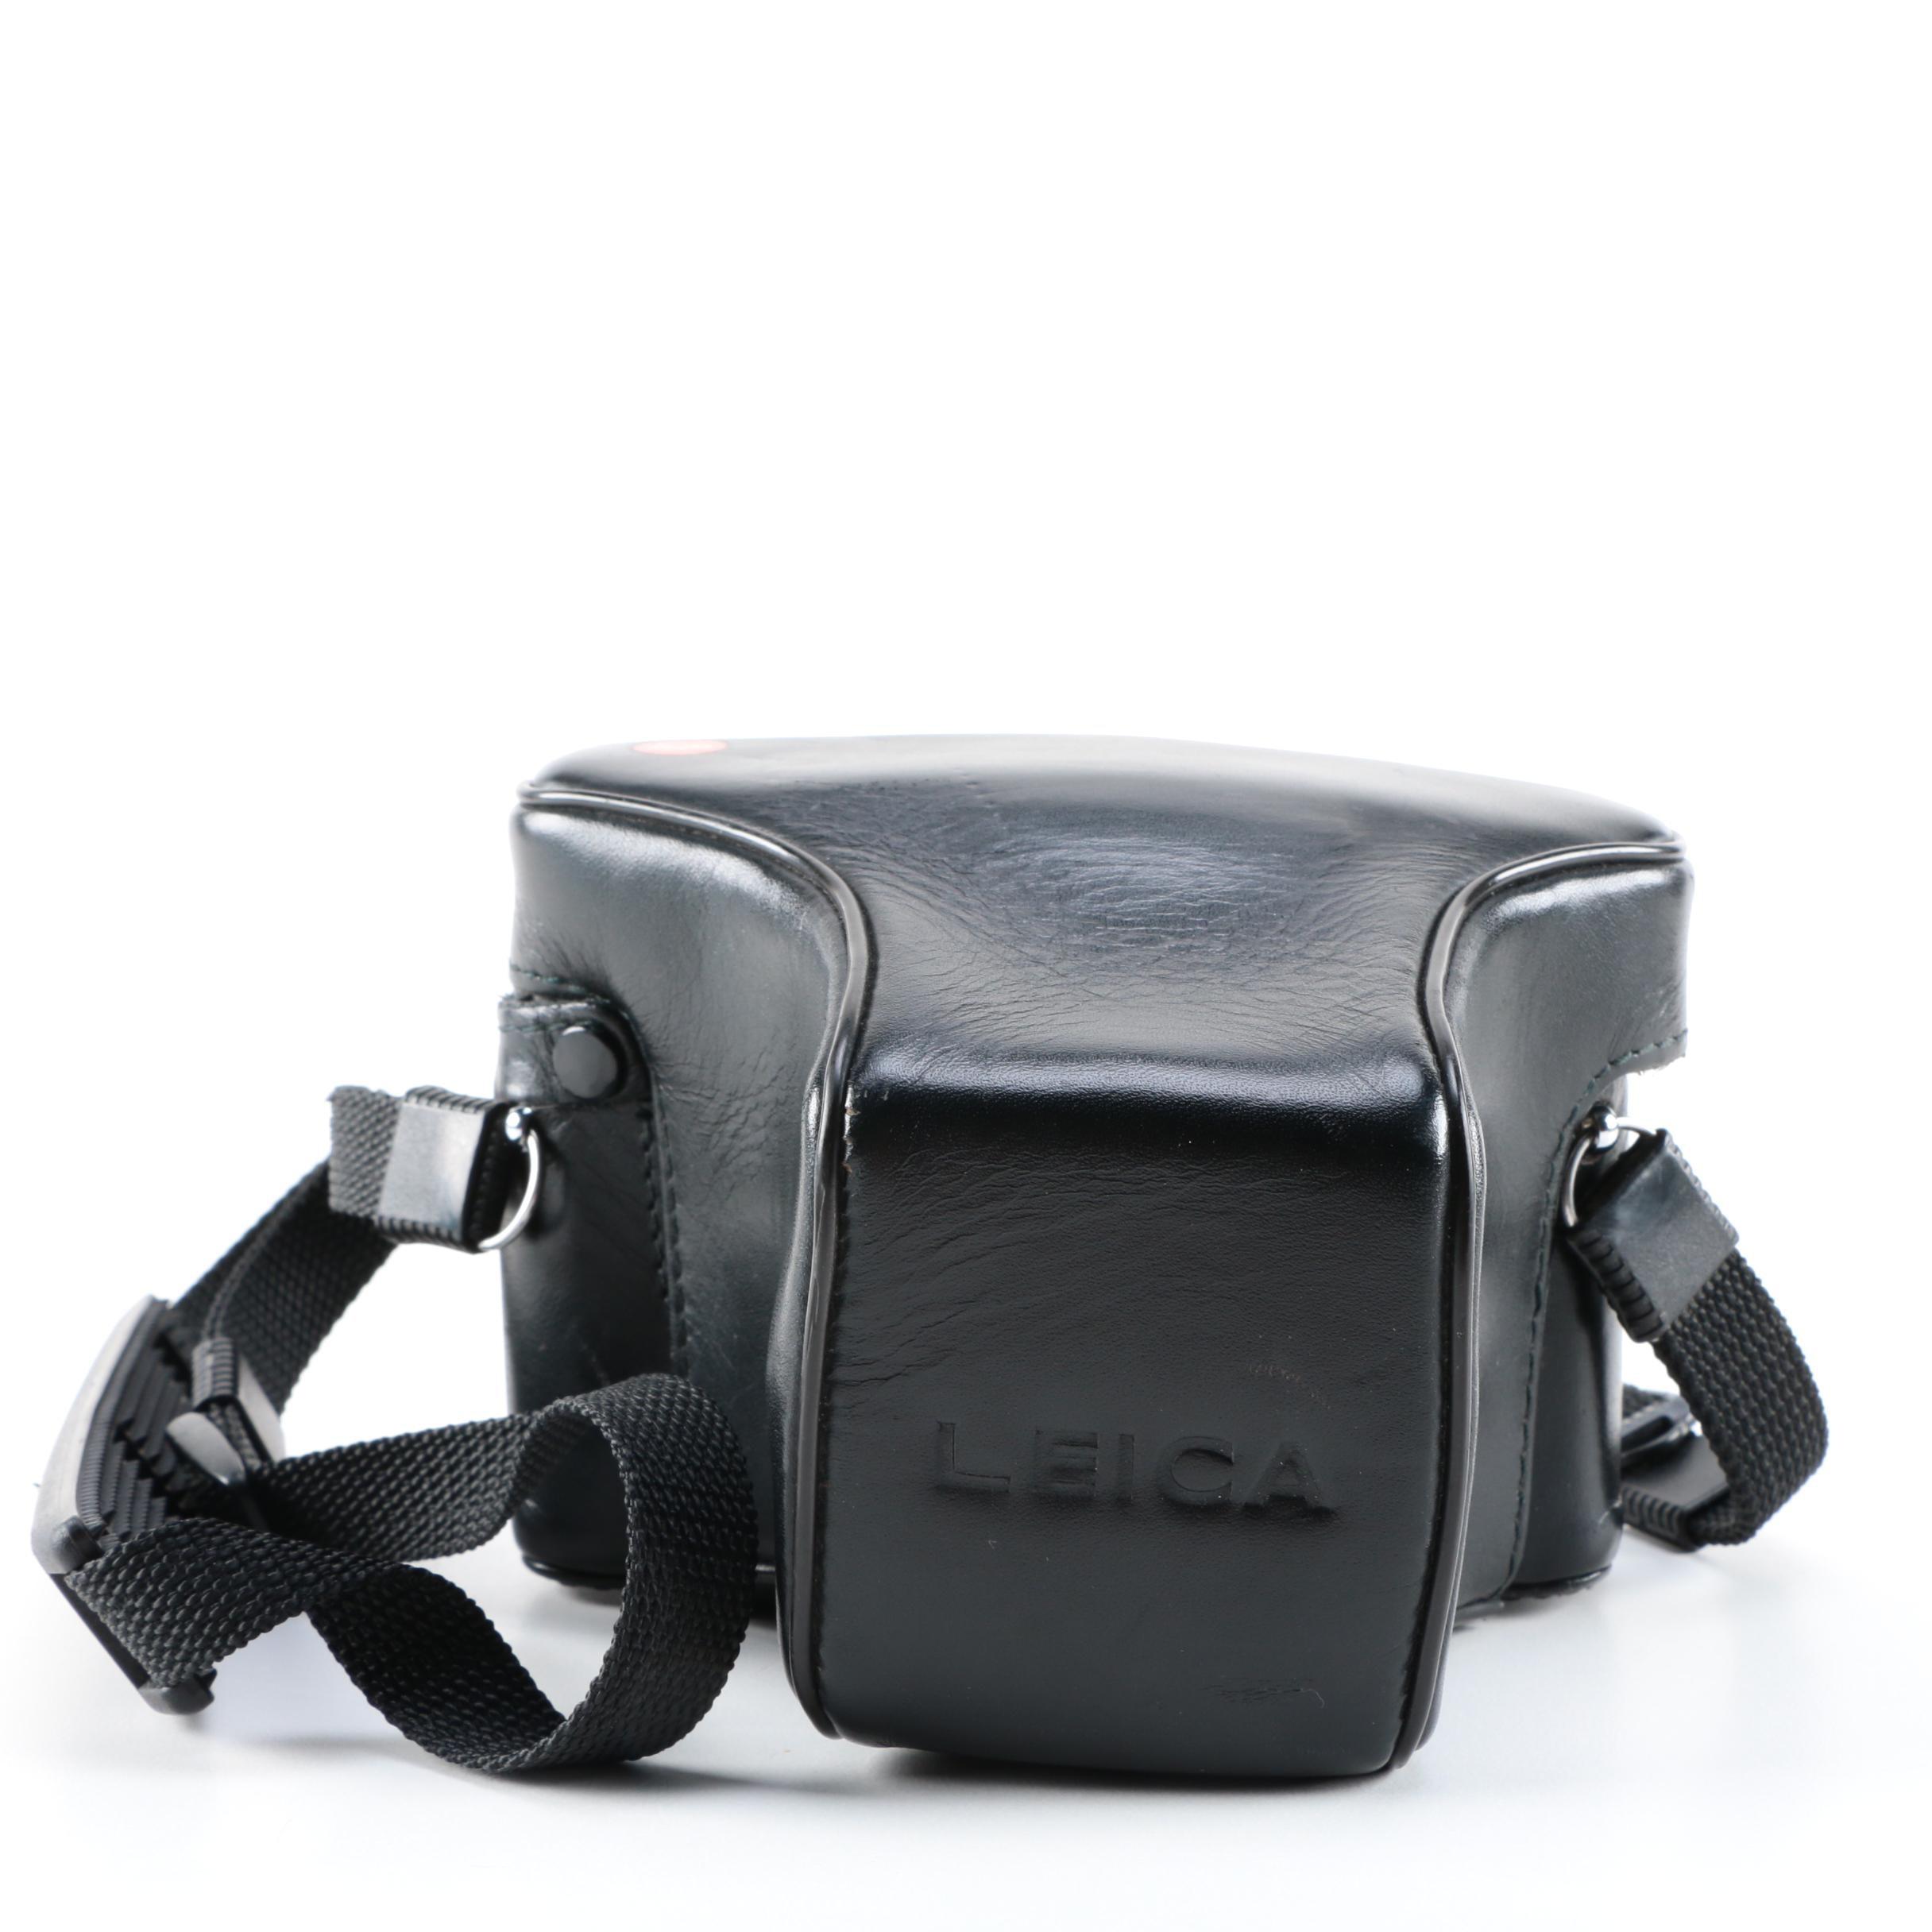 Leica R4 by Leitz